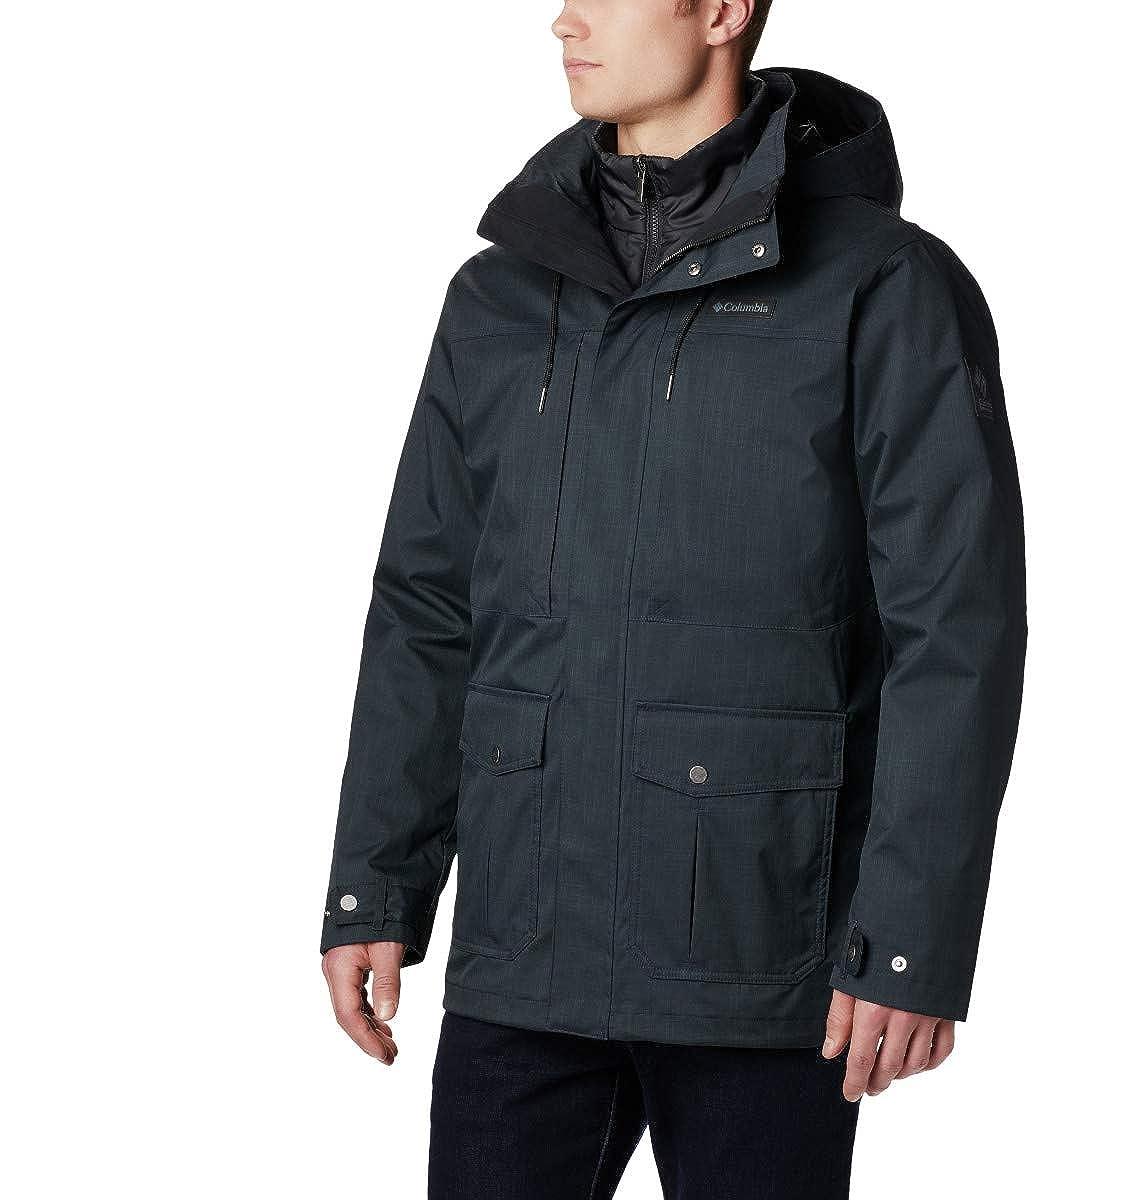 TALLA S. Columbia Horizons Pine Interchange Jacket Chaqueta Impermeable, Poliéster, Hombre